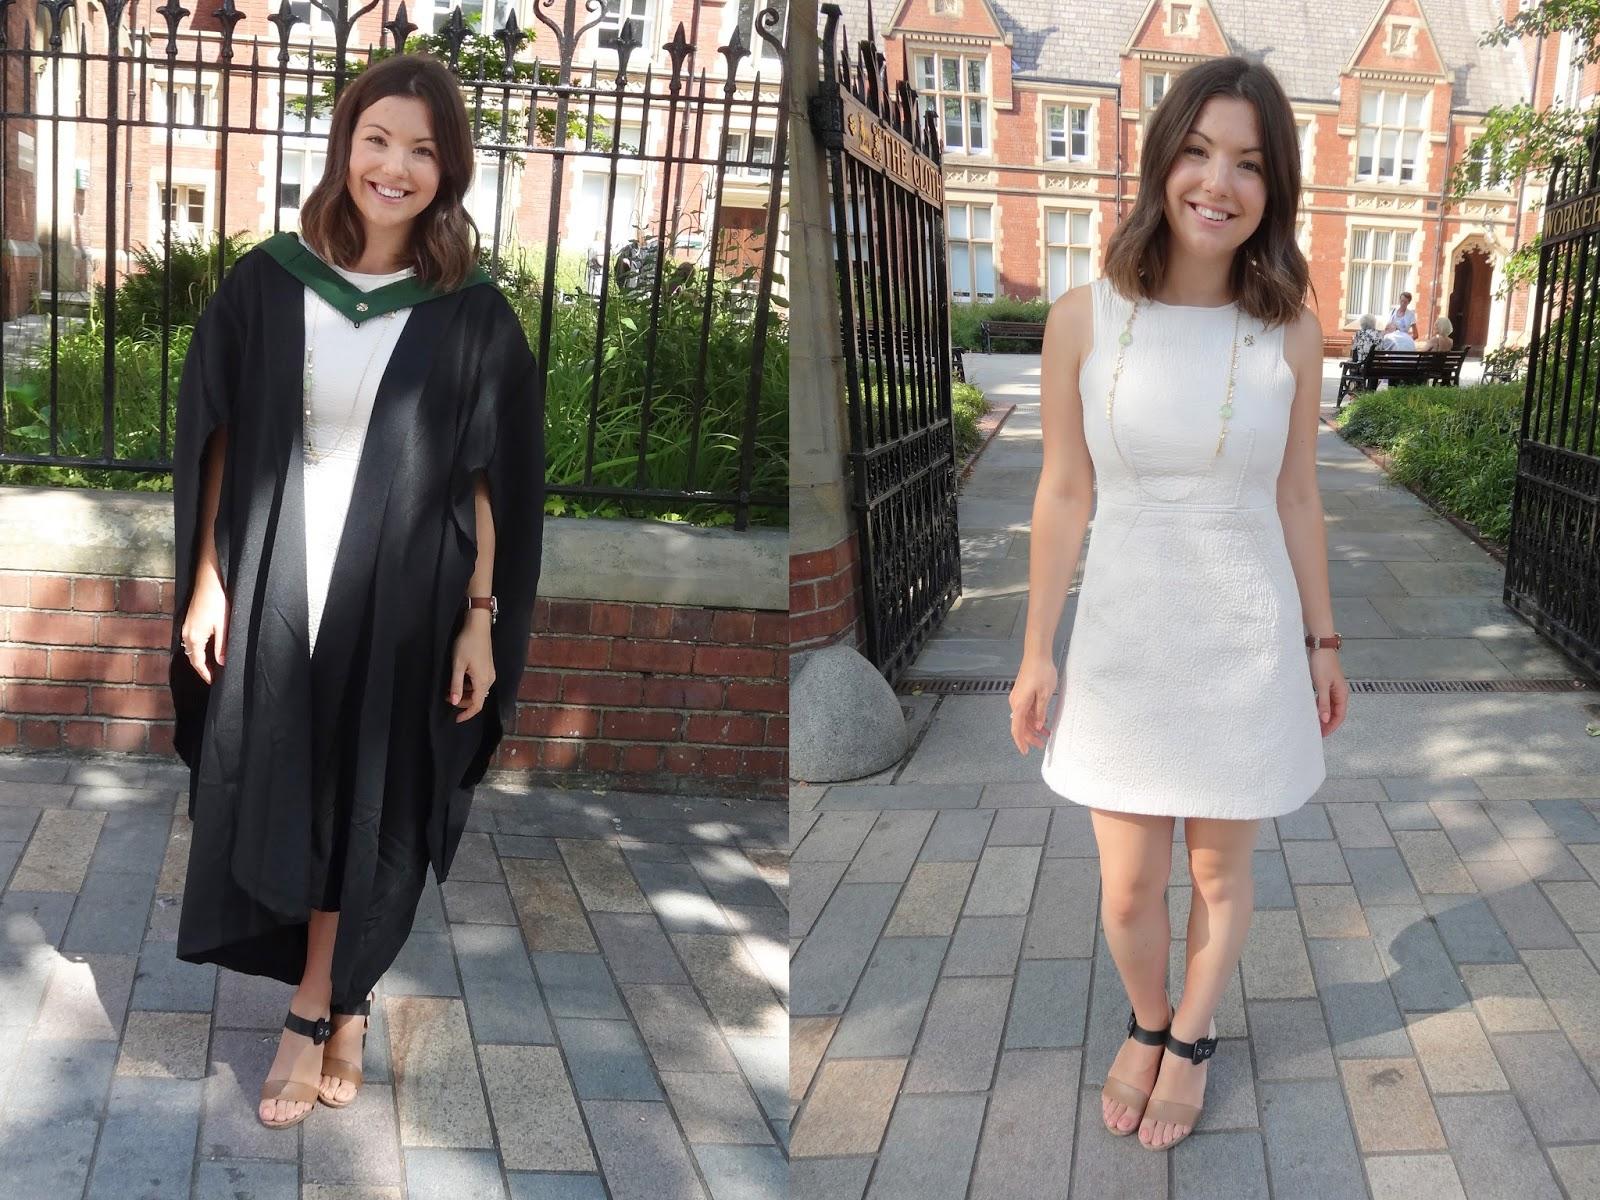 leeds university graduation what to wear